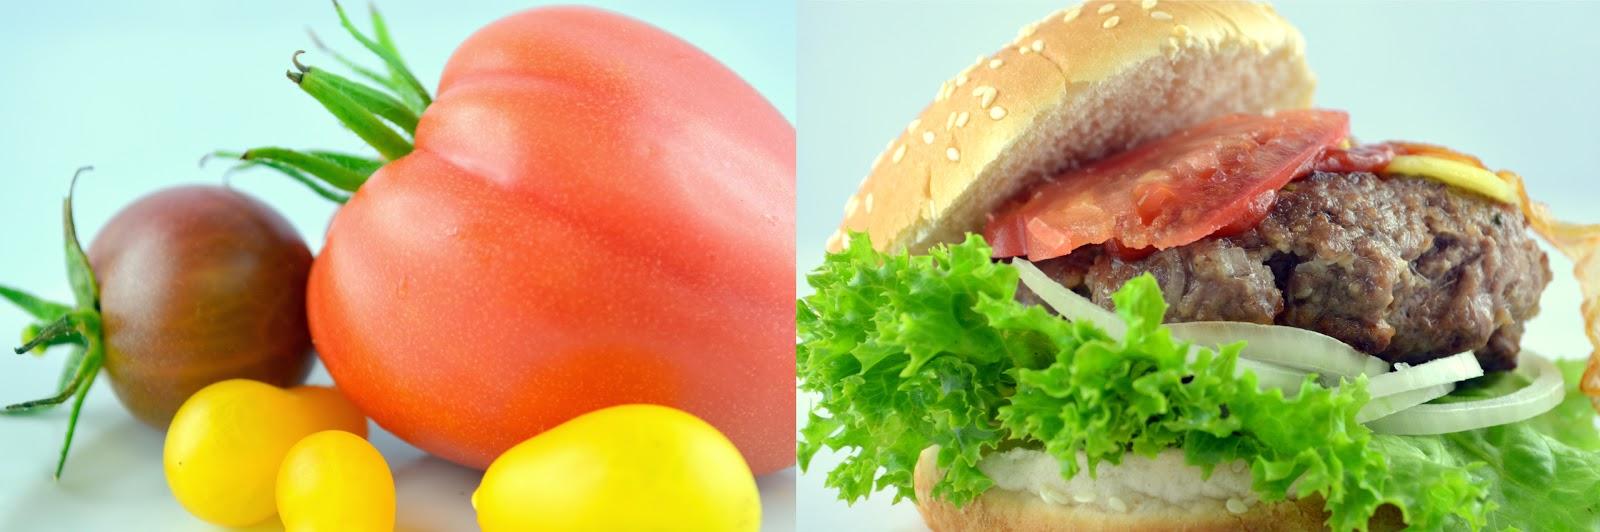 gaumenthrill ganz klassisch ganz lecker cheeseburger. Black Bedroom Furniture Sets. Home Design Ideas